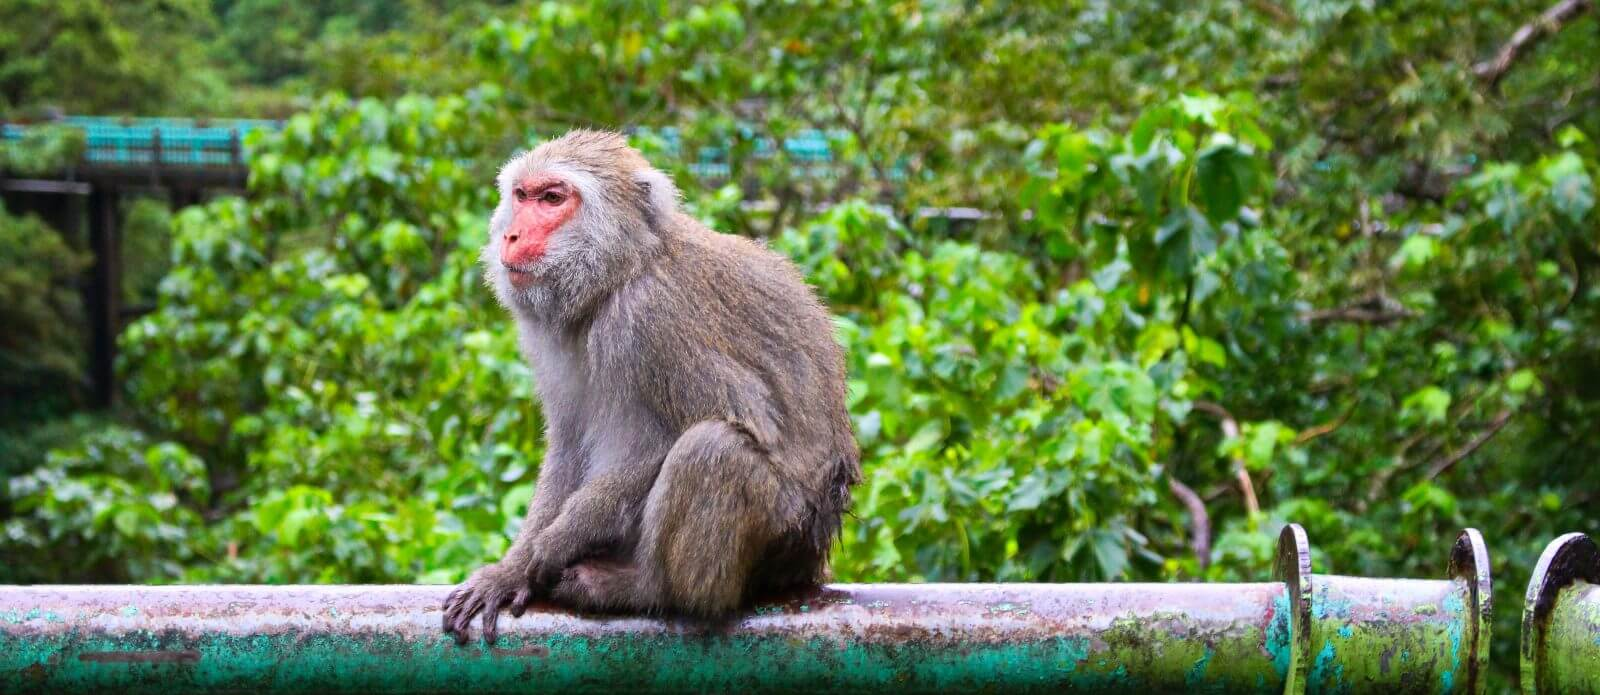 Incredible Taitung Coastal Tour: Dulan, Bridge of the Immortals, Monkeys and More!